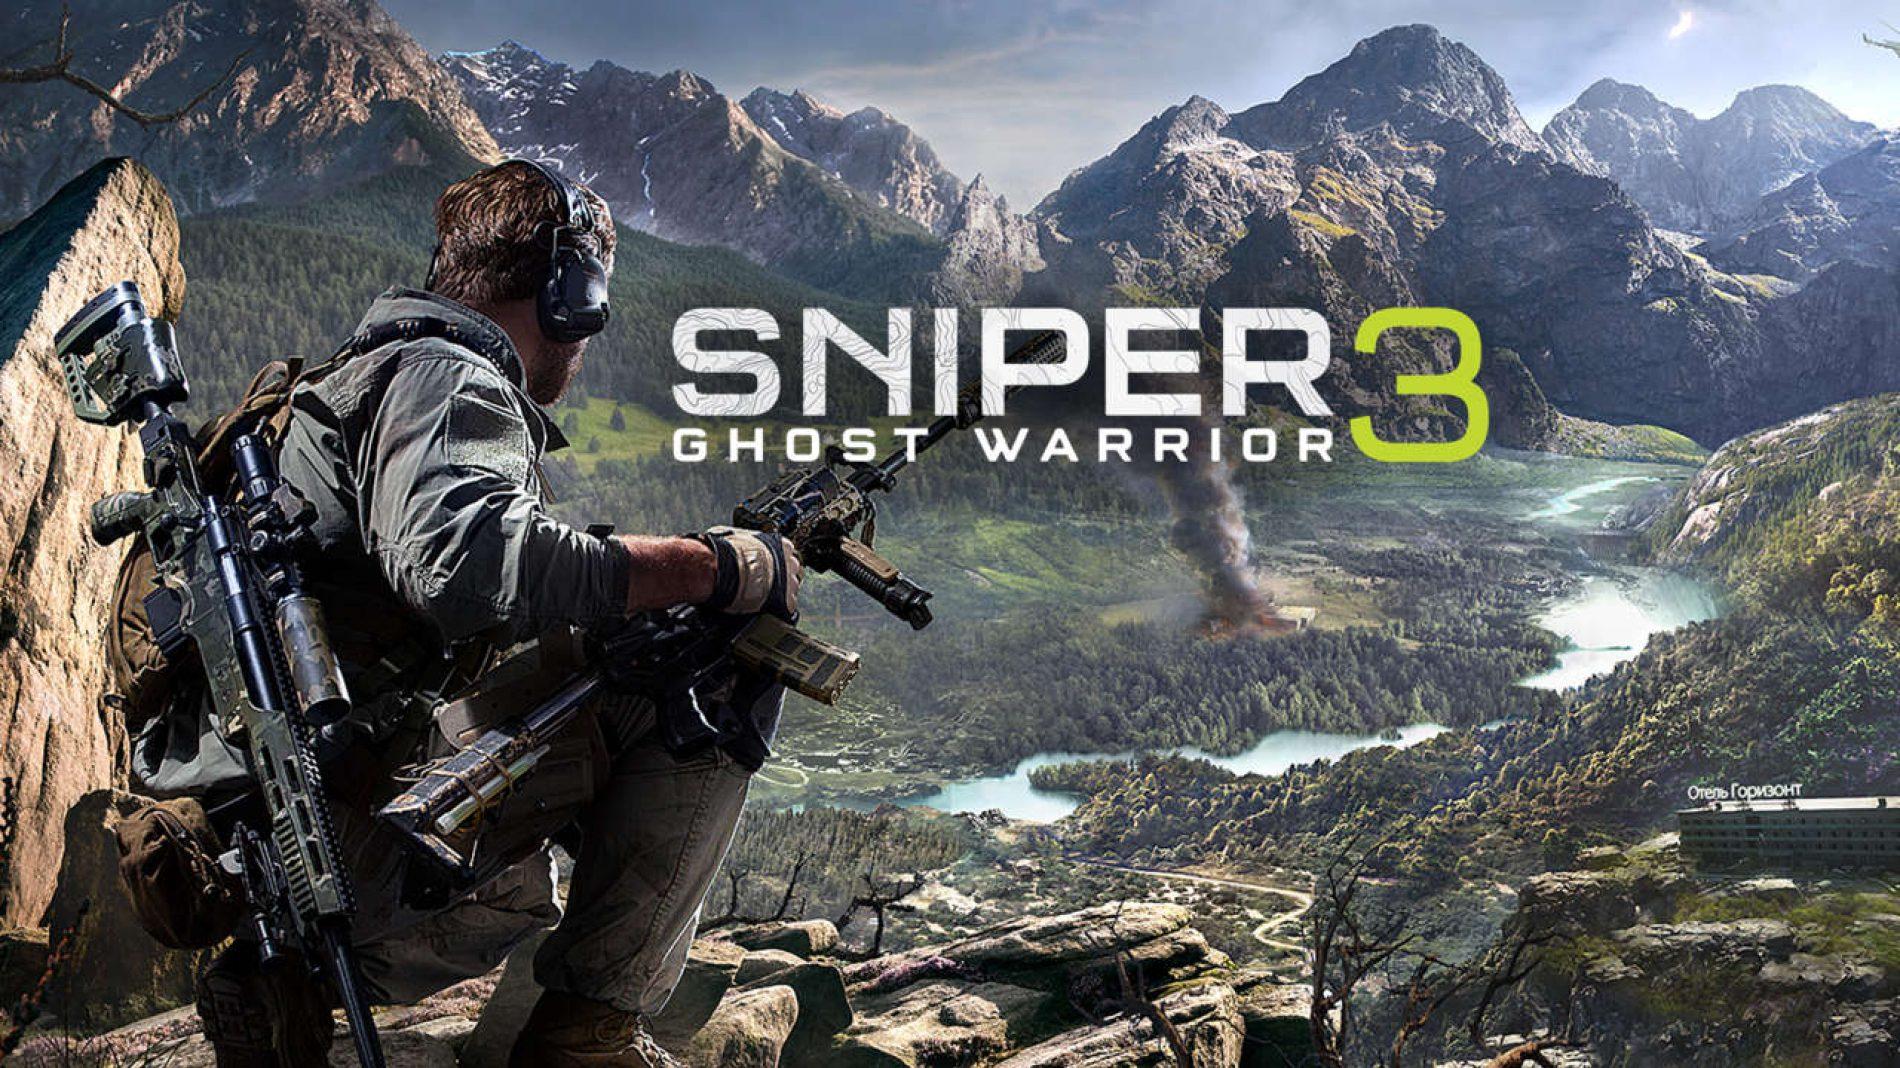 Sniper ghost warrior 3 : Un test tout en finesse